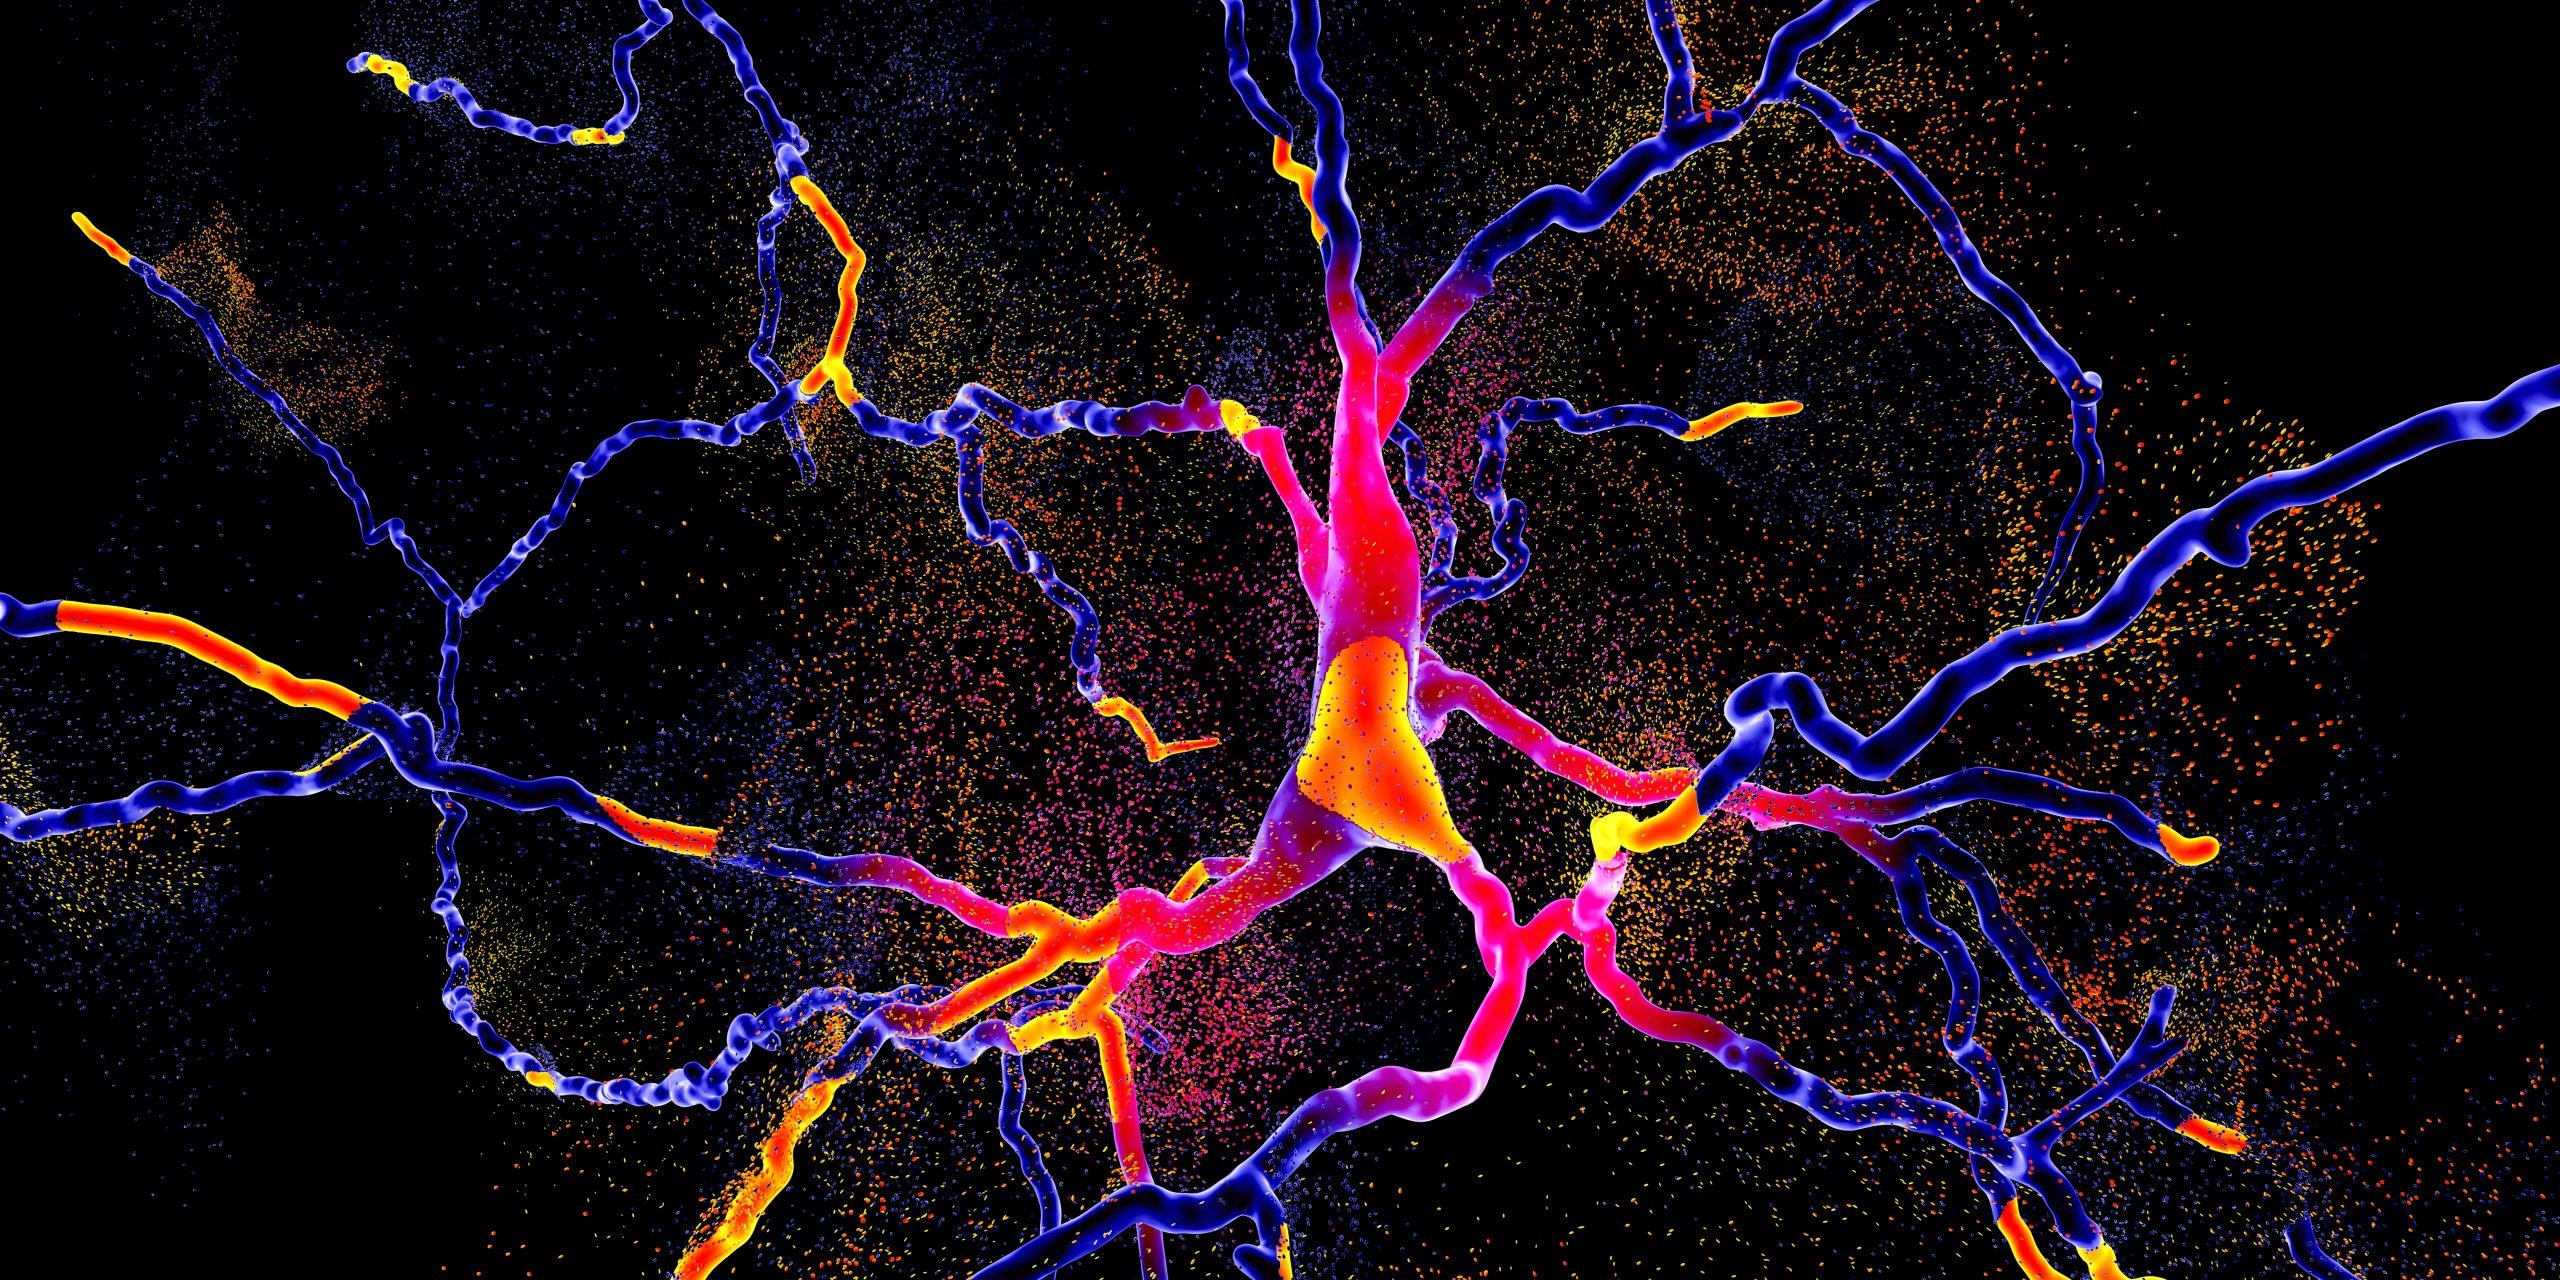 brighly coloured neuron degenerating-neurodegeneration